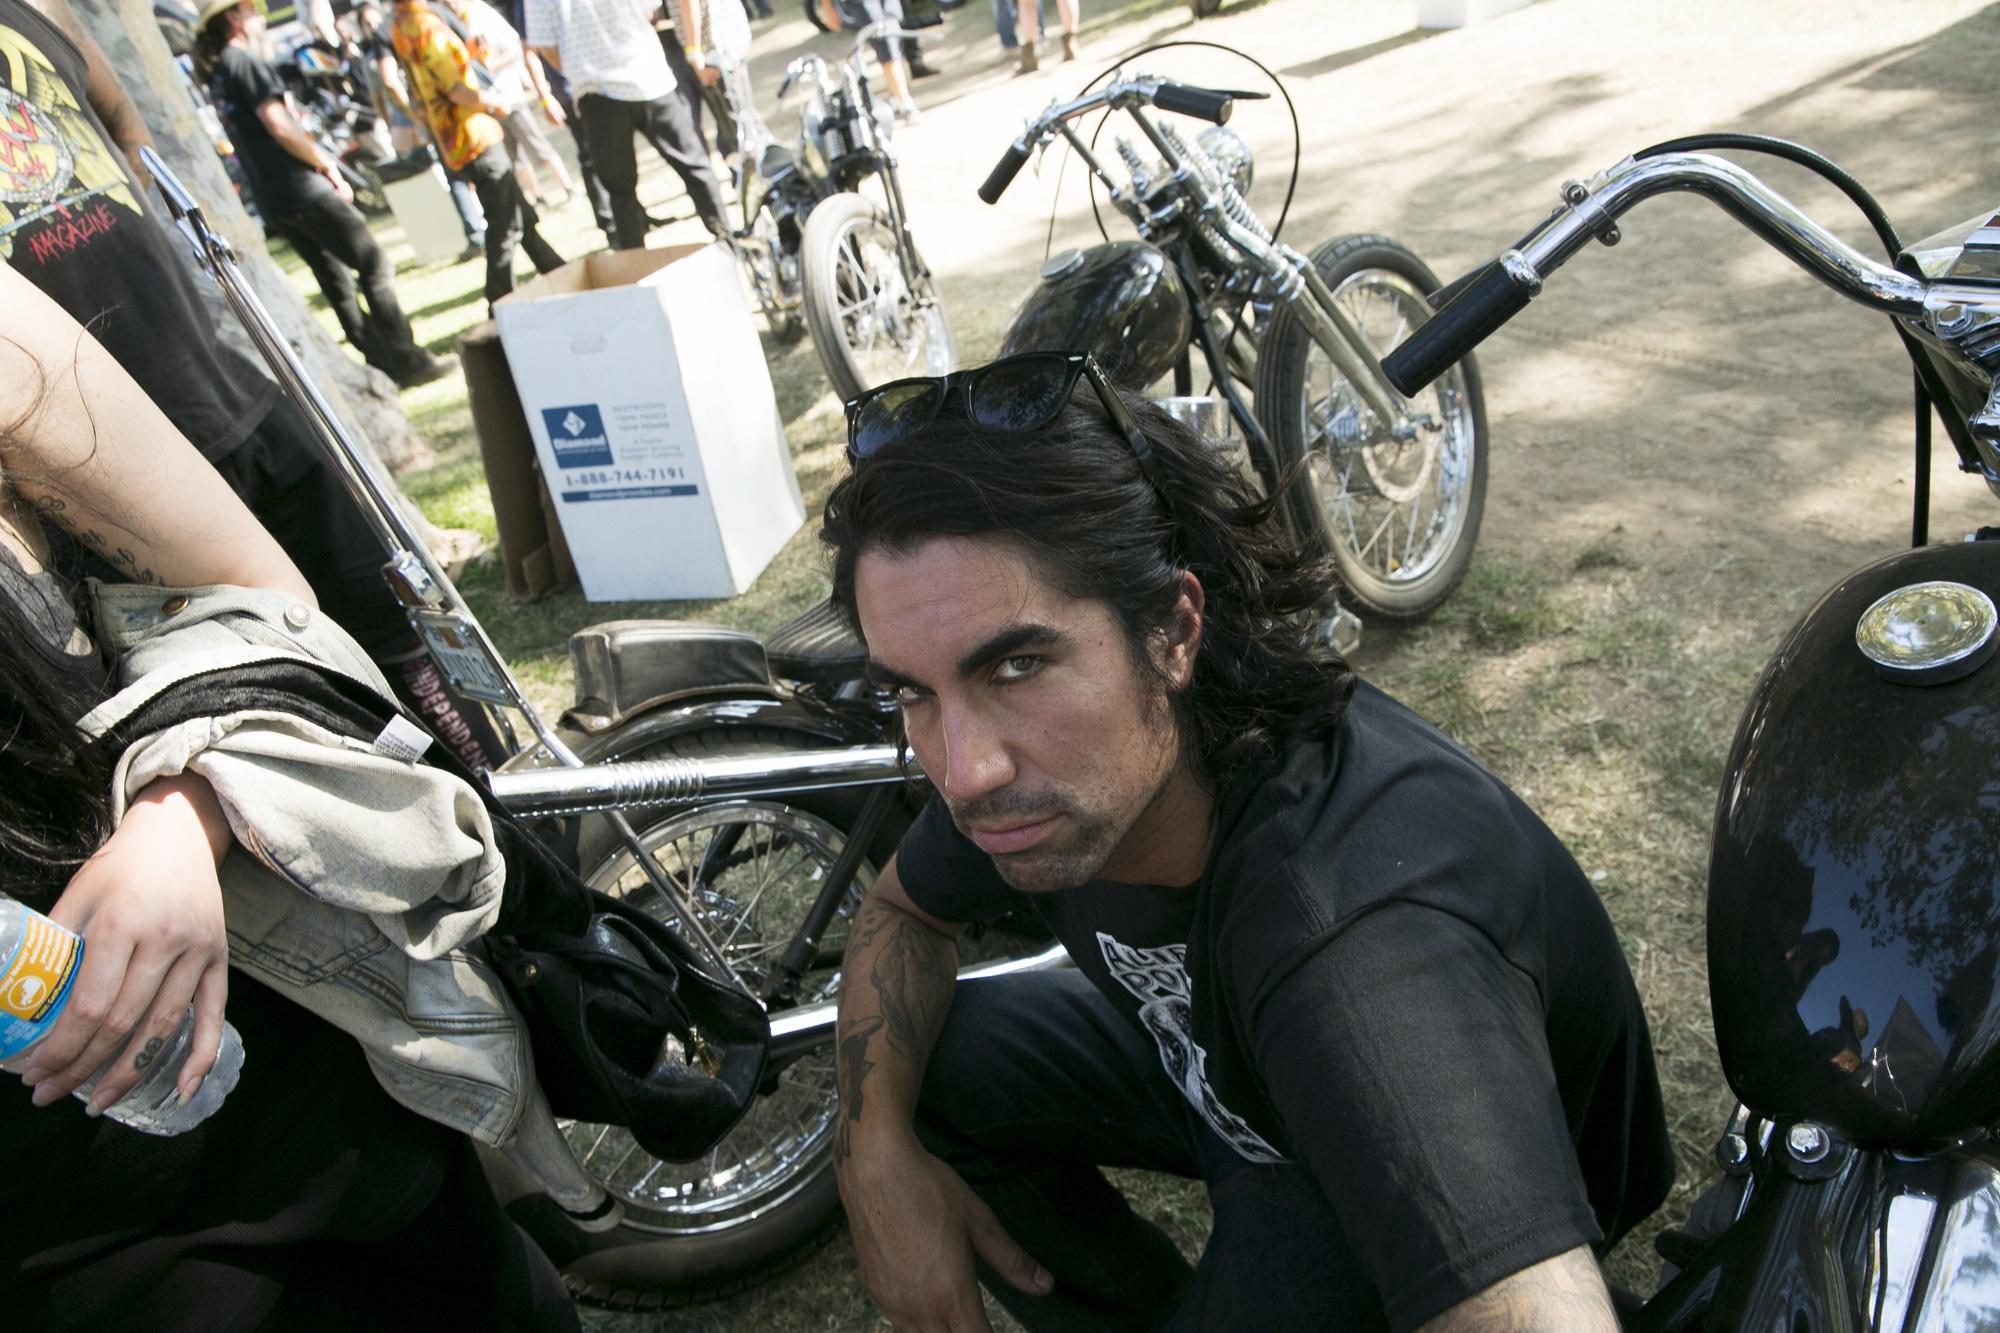 Born Free 8 Motorcycle Show-131.jpg